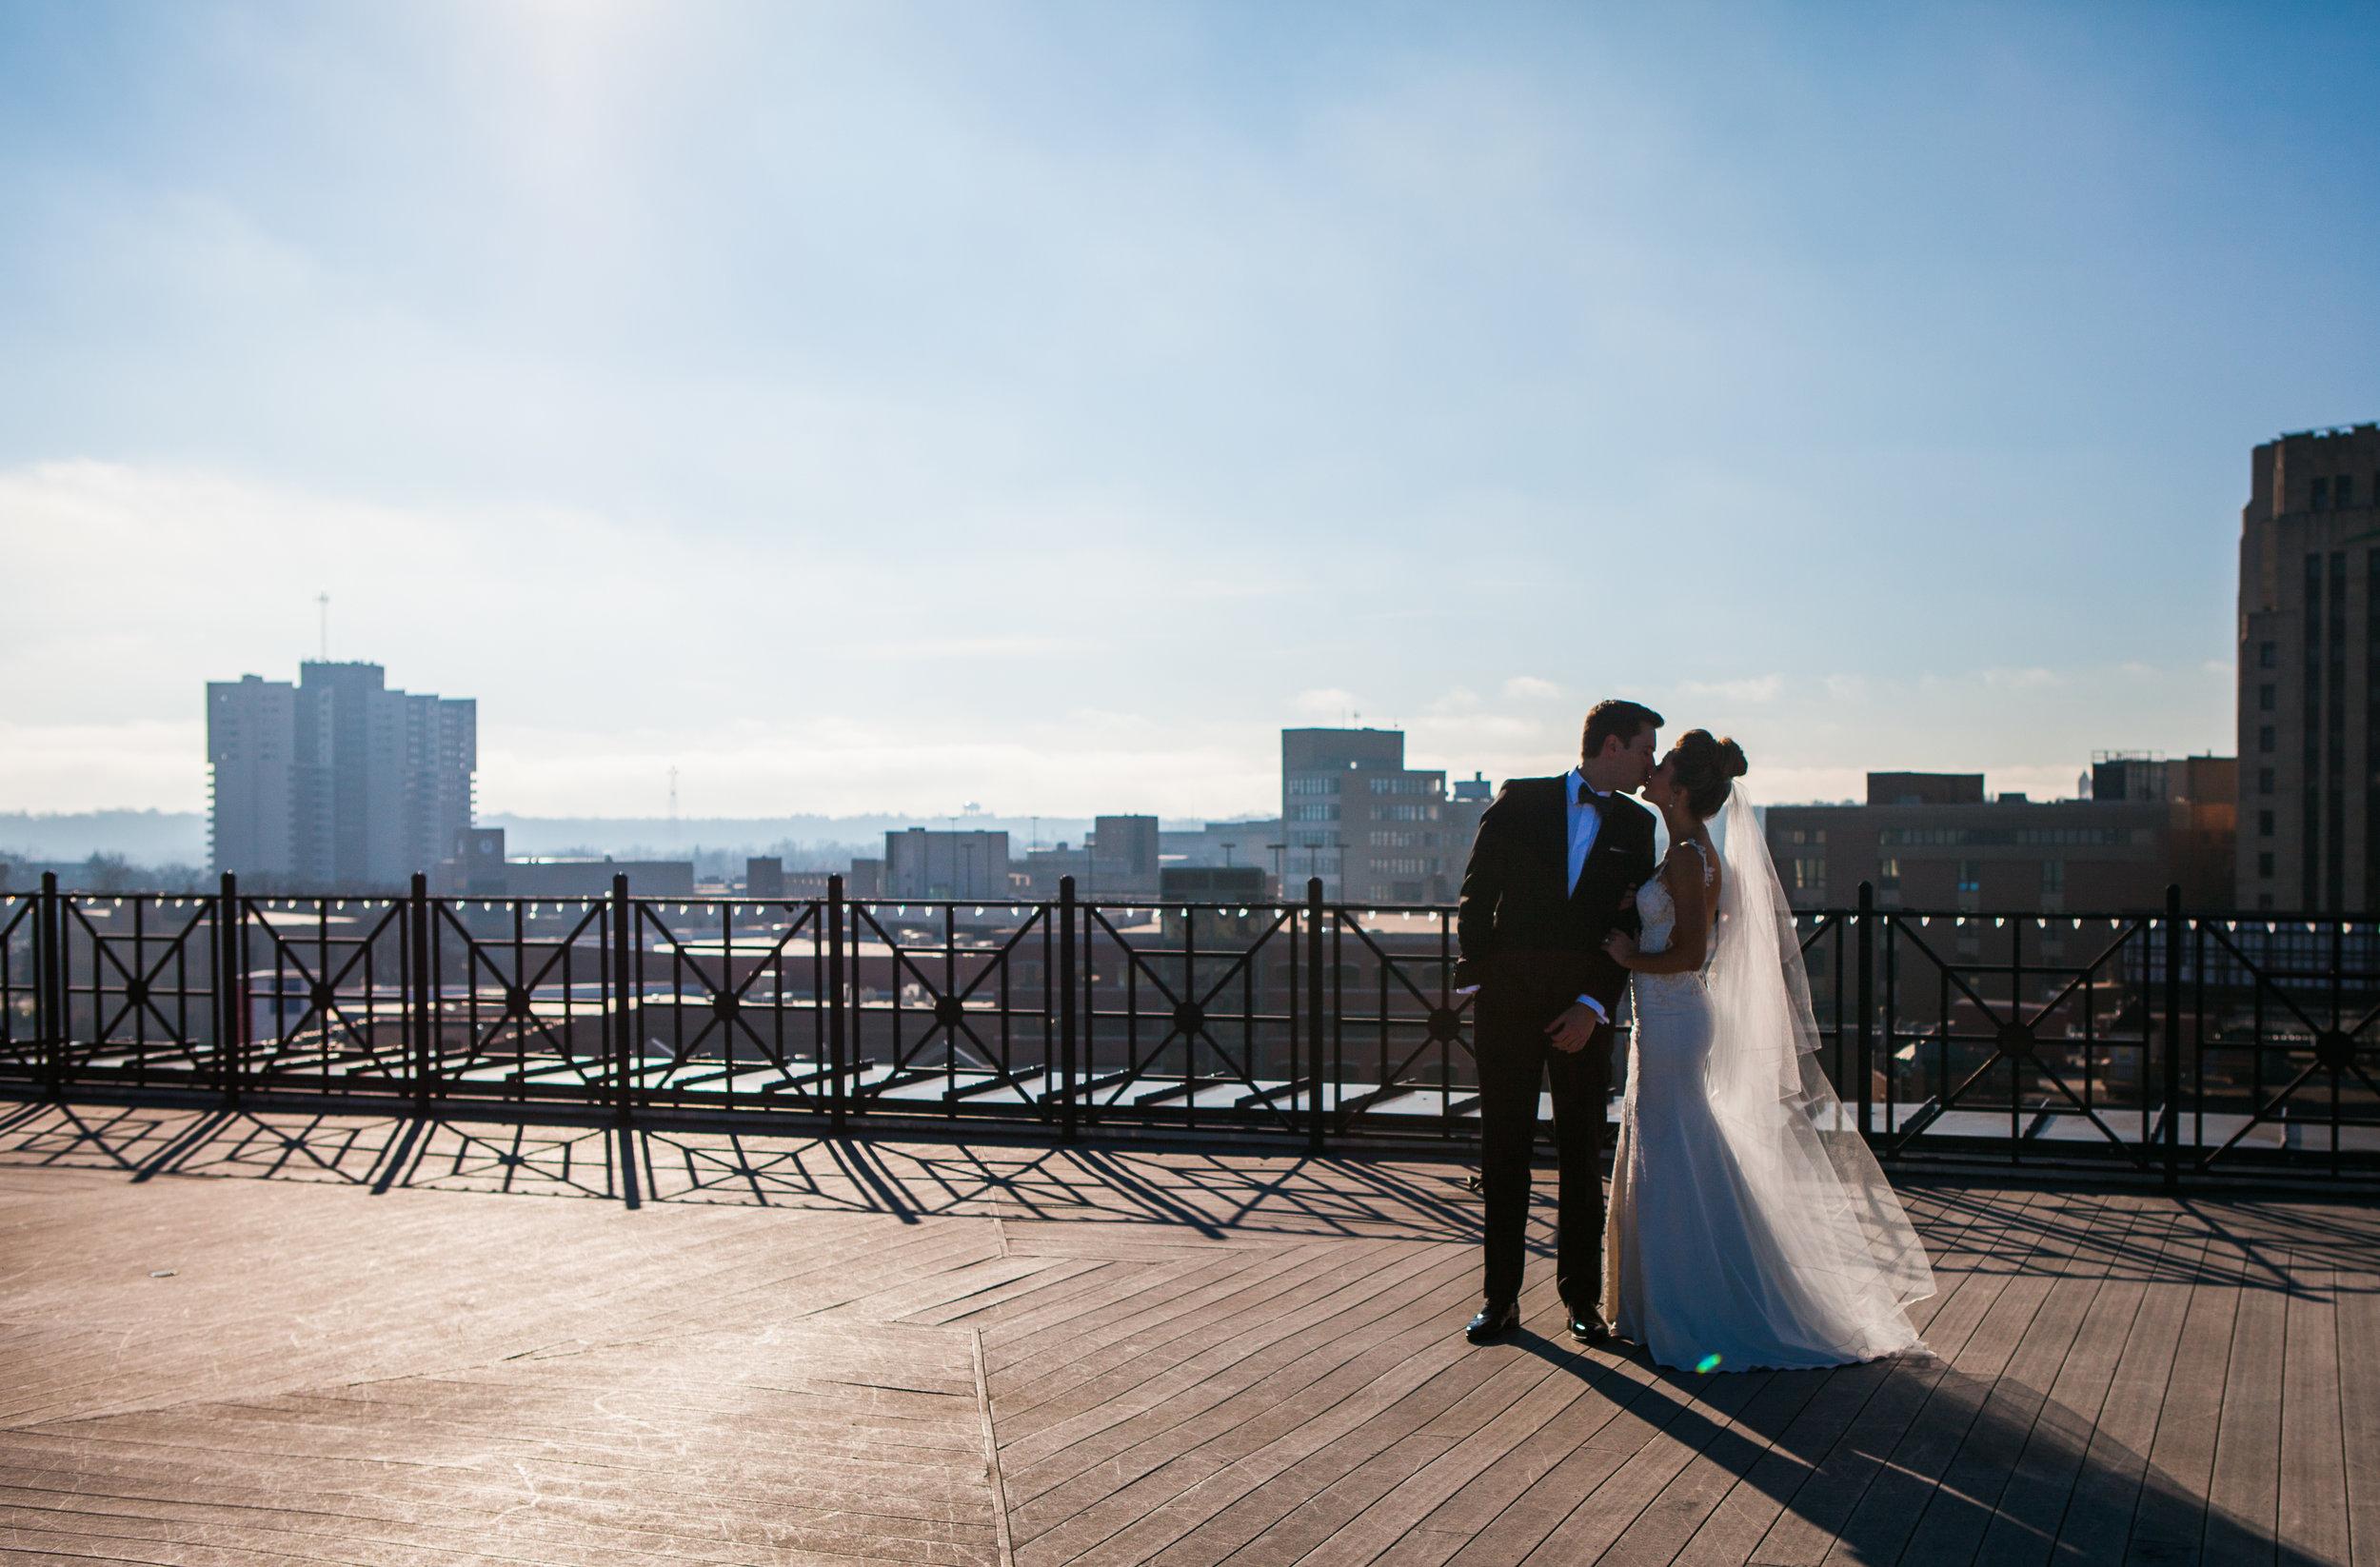 wedding shots-1.jpg